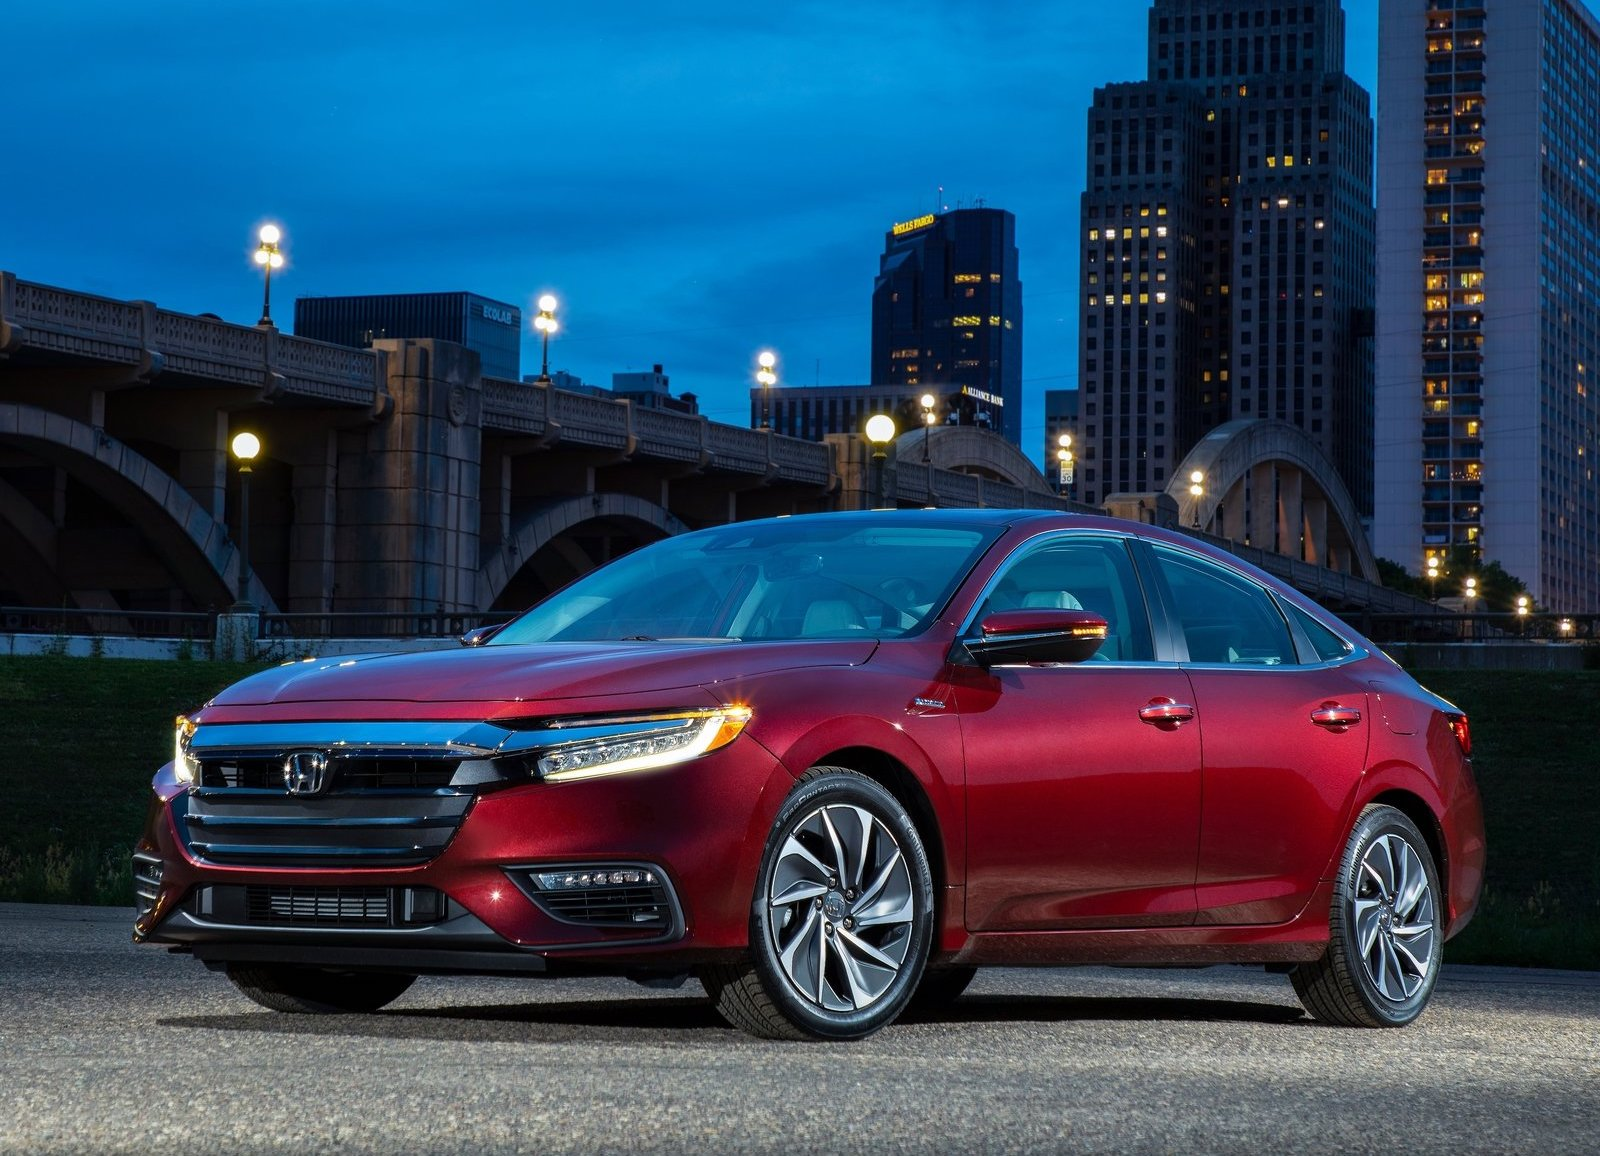 2019 Honda Insight red city night